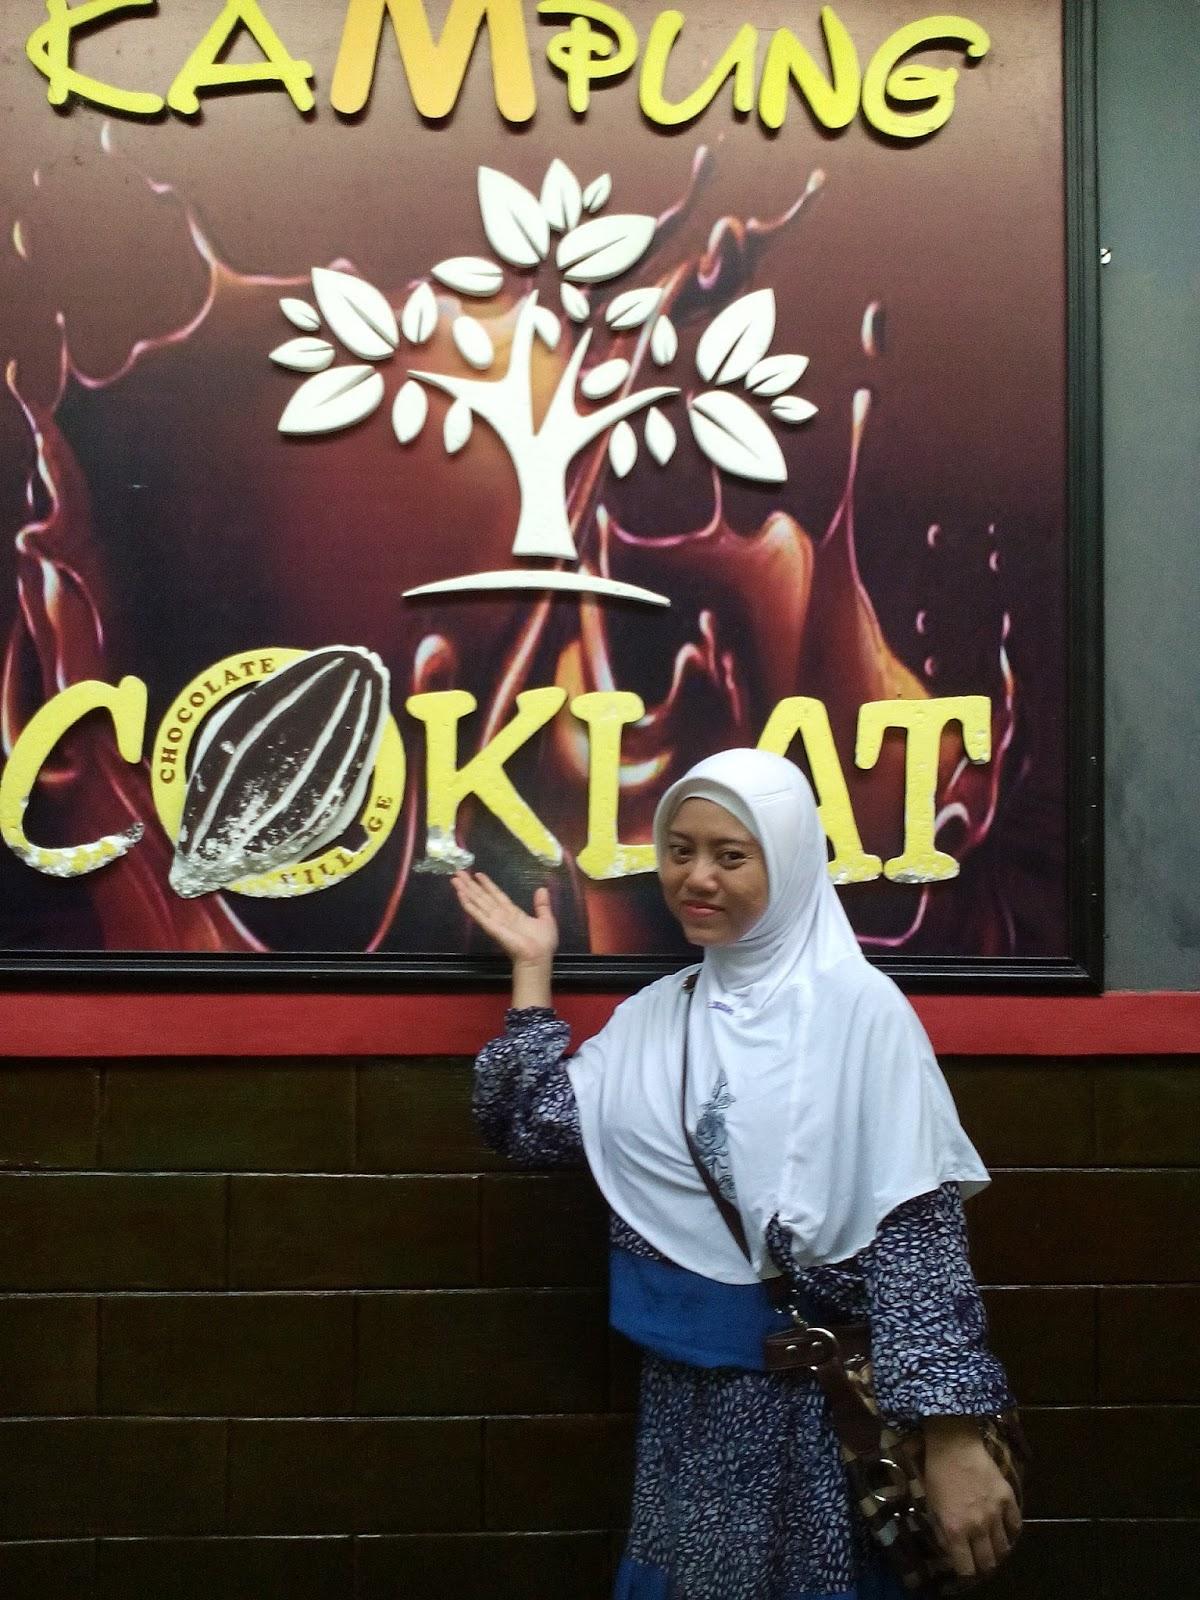 Nodiwa Wisata Edukasi Kampung Coklat Water Park Sumber Udel Hari